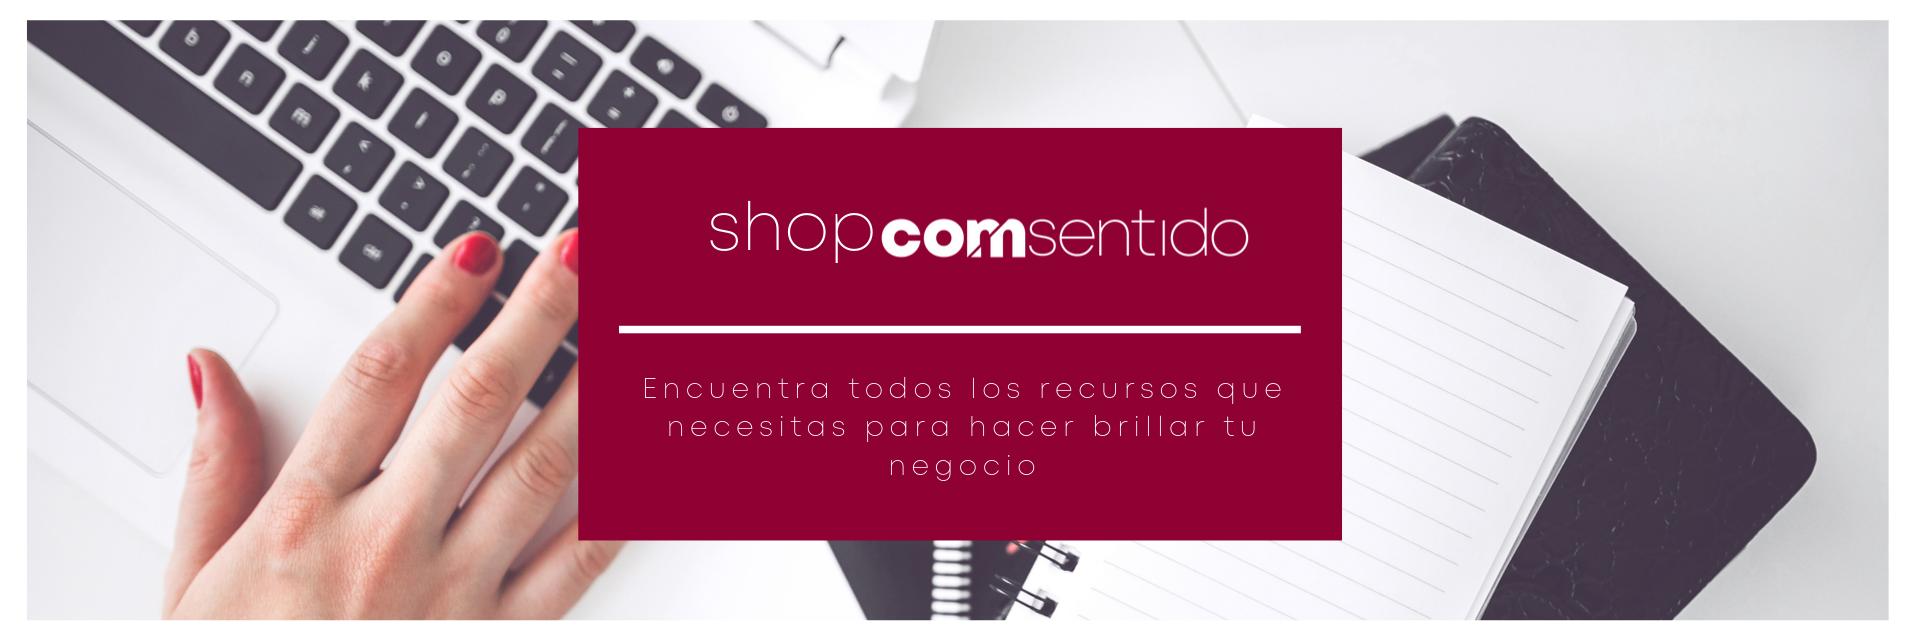 shop coMsentido